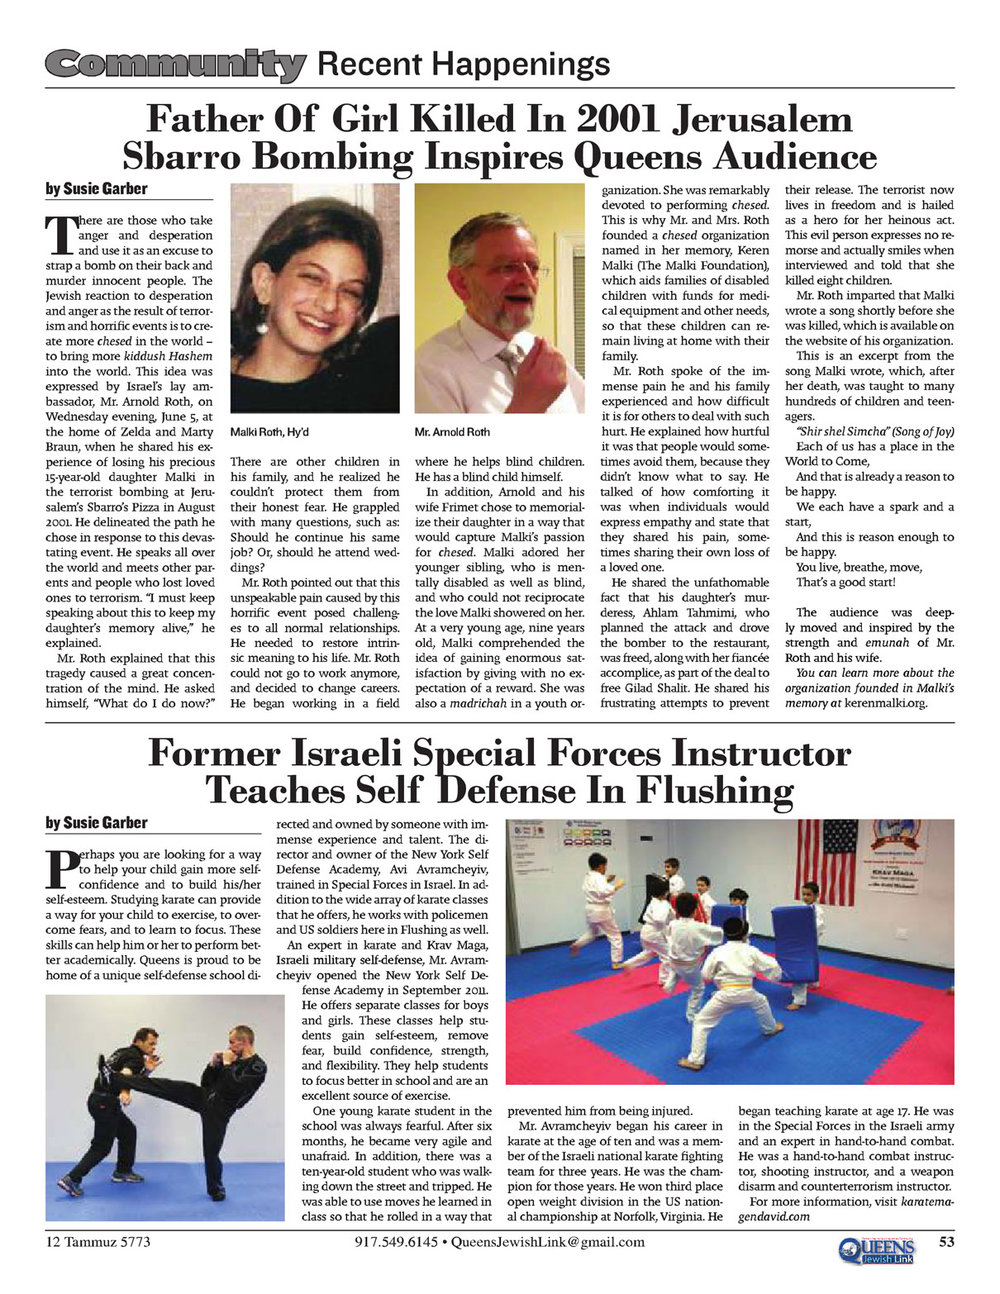 QJL-Article.jpg